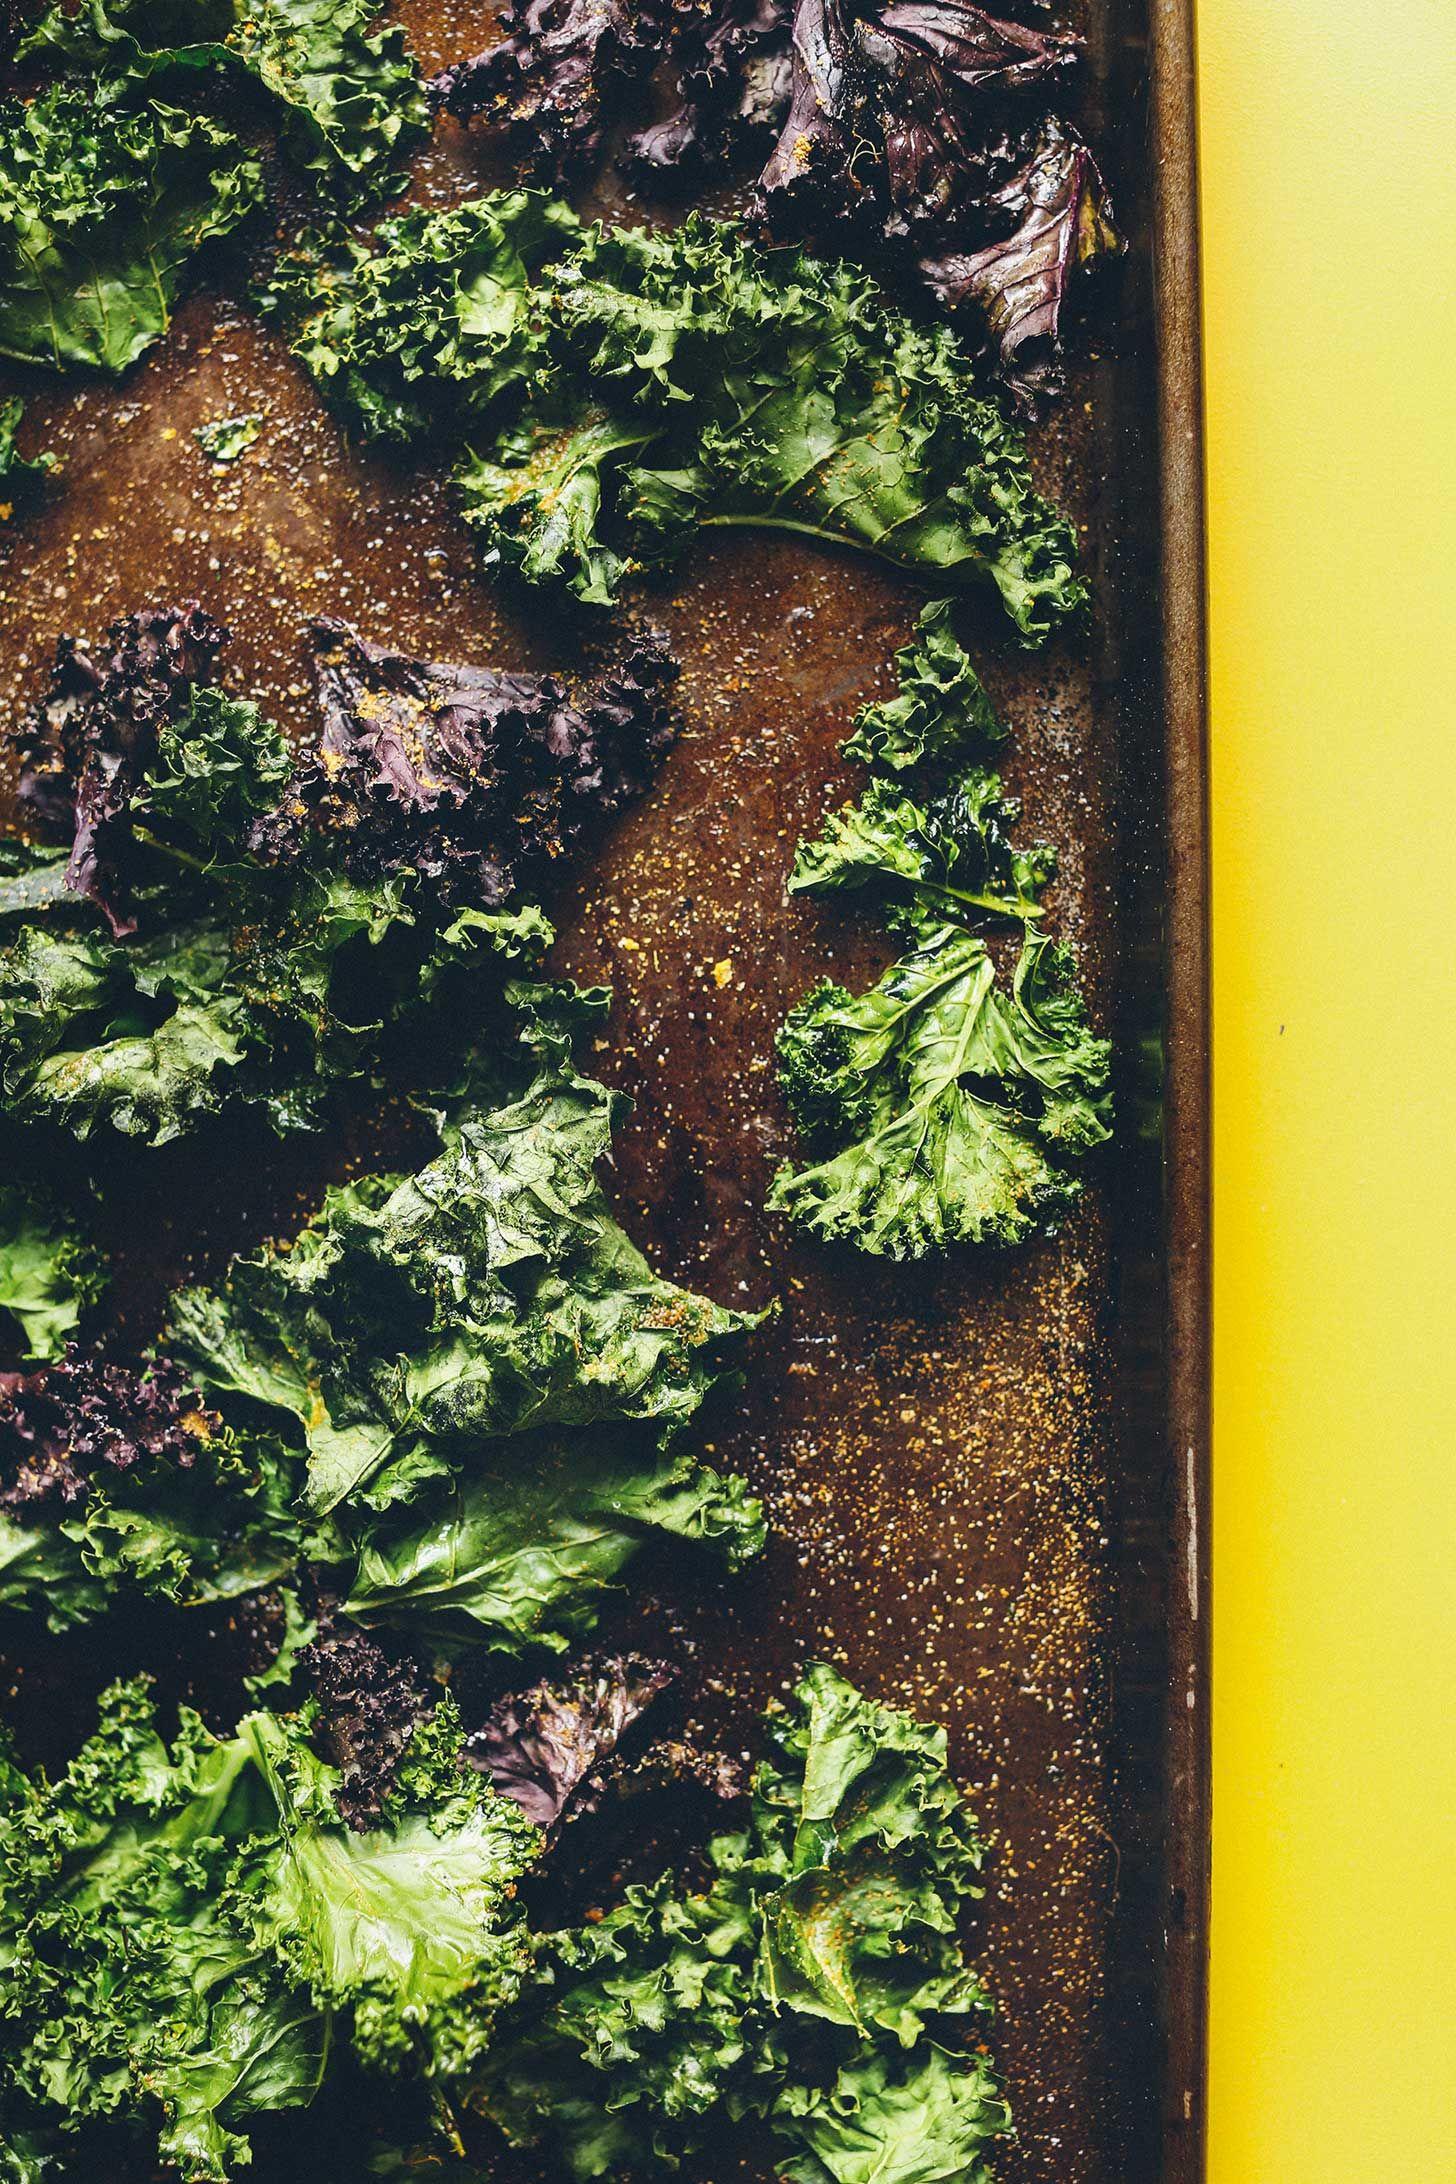 How to Make Kale Chips How to Make Kale Chips! 25 minutes, Perfectly crispy, SO healthy!